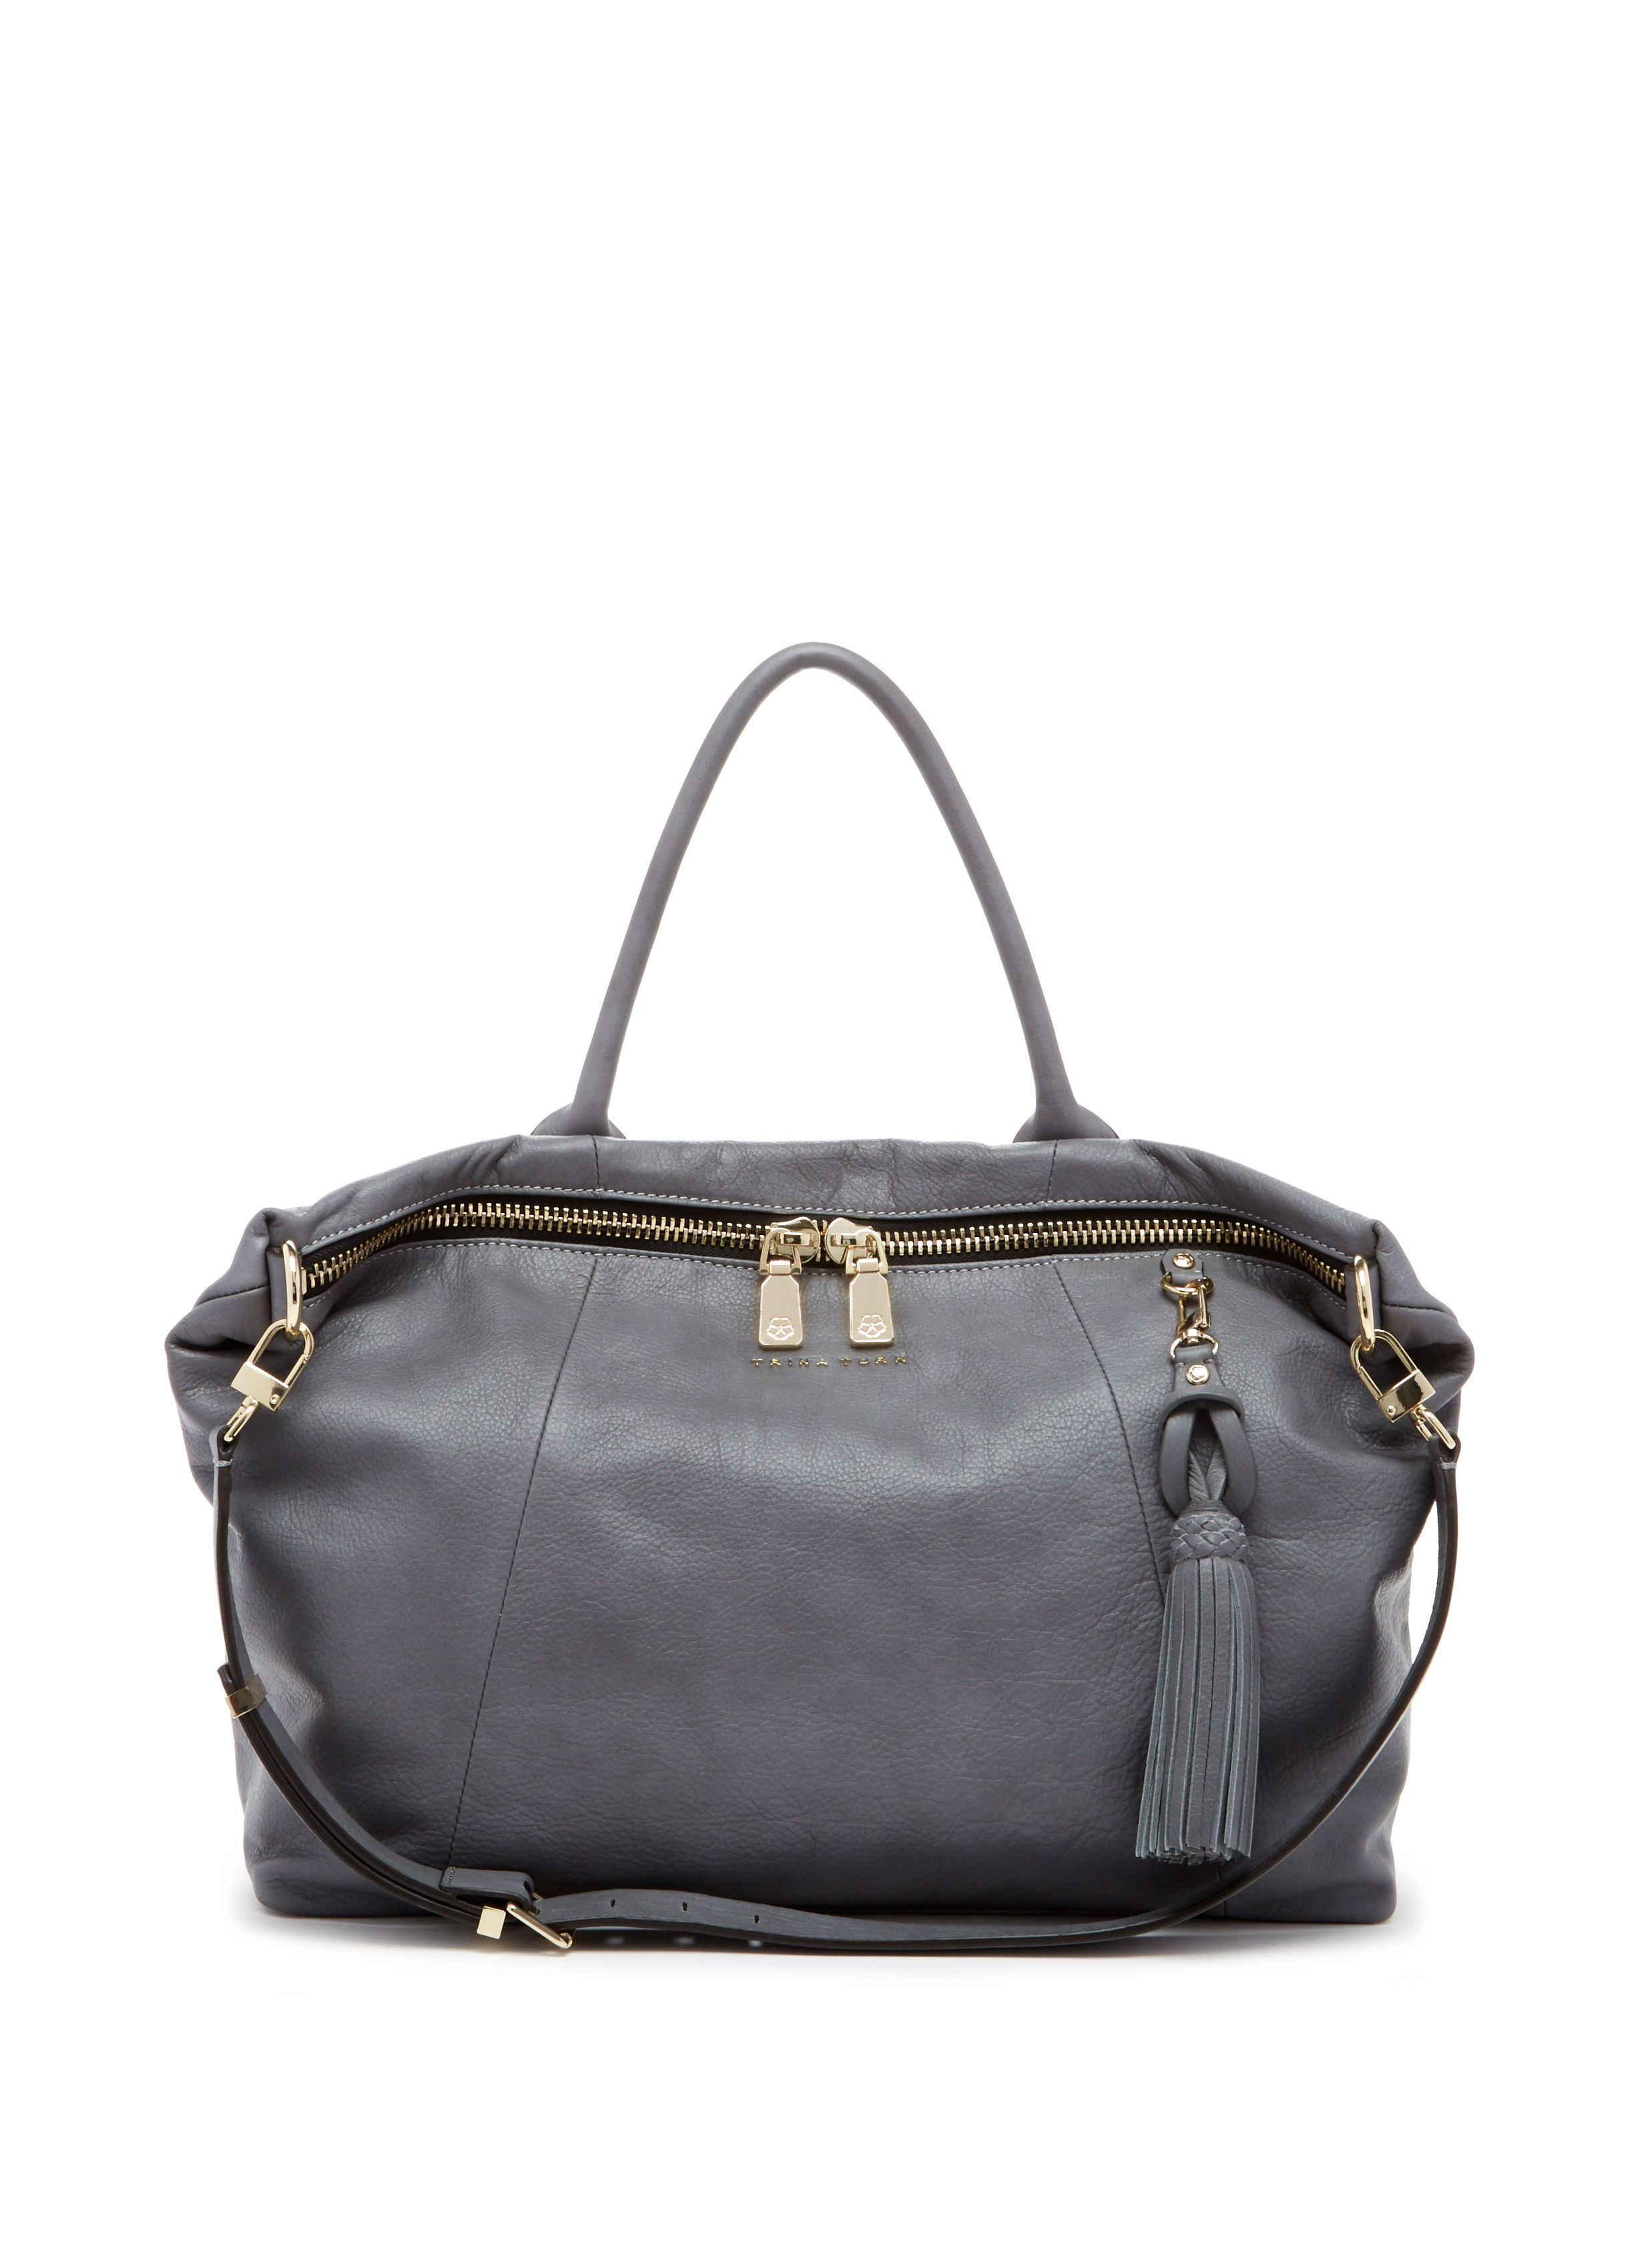 Saratoga Large Satchel Trinaturk I Am The Bag Lady